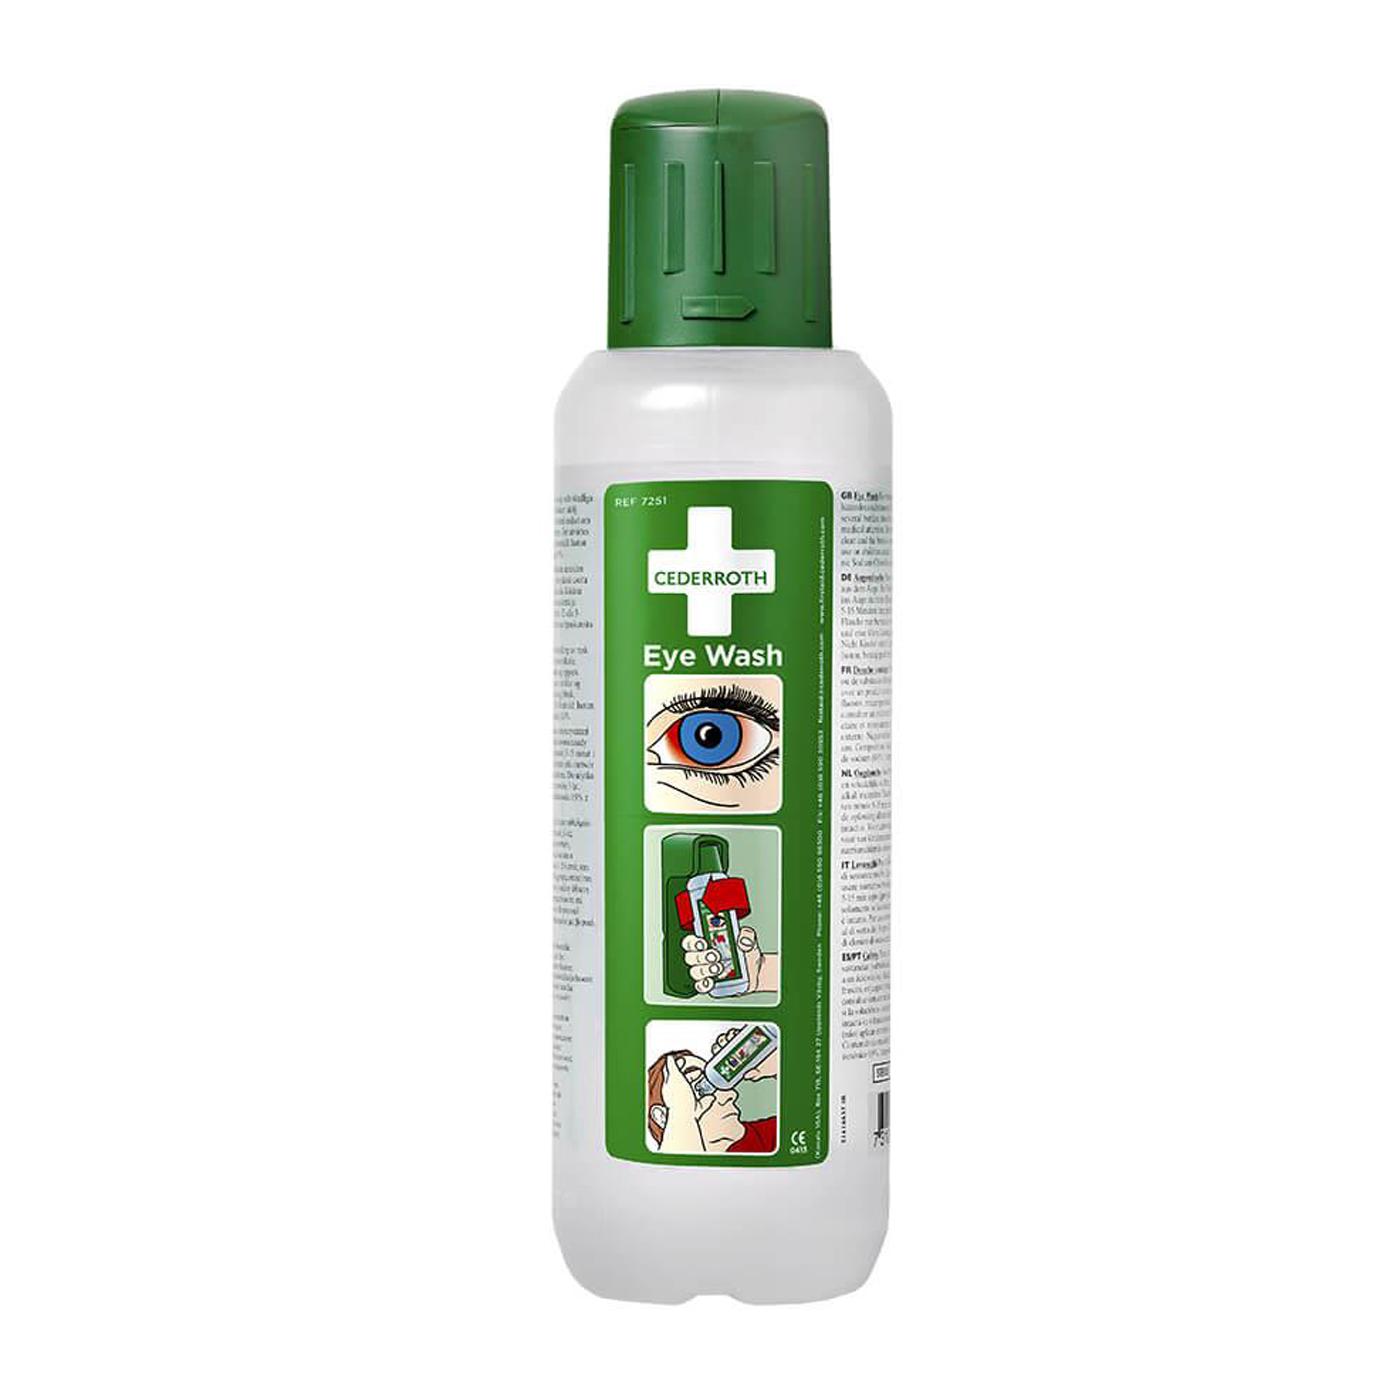 Płukanka do oczu Cederroth Eye Wash, 2x500ml 725200